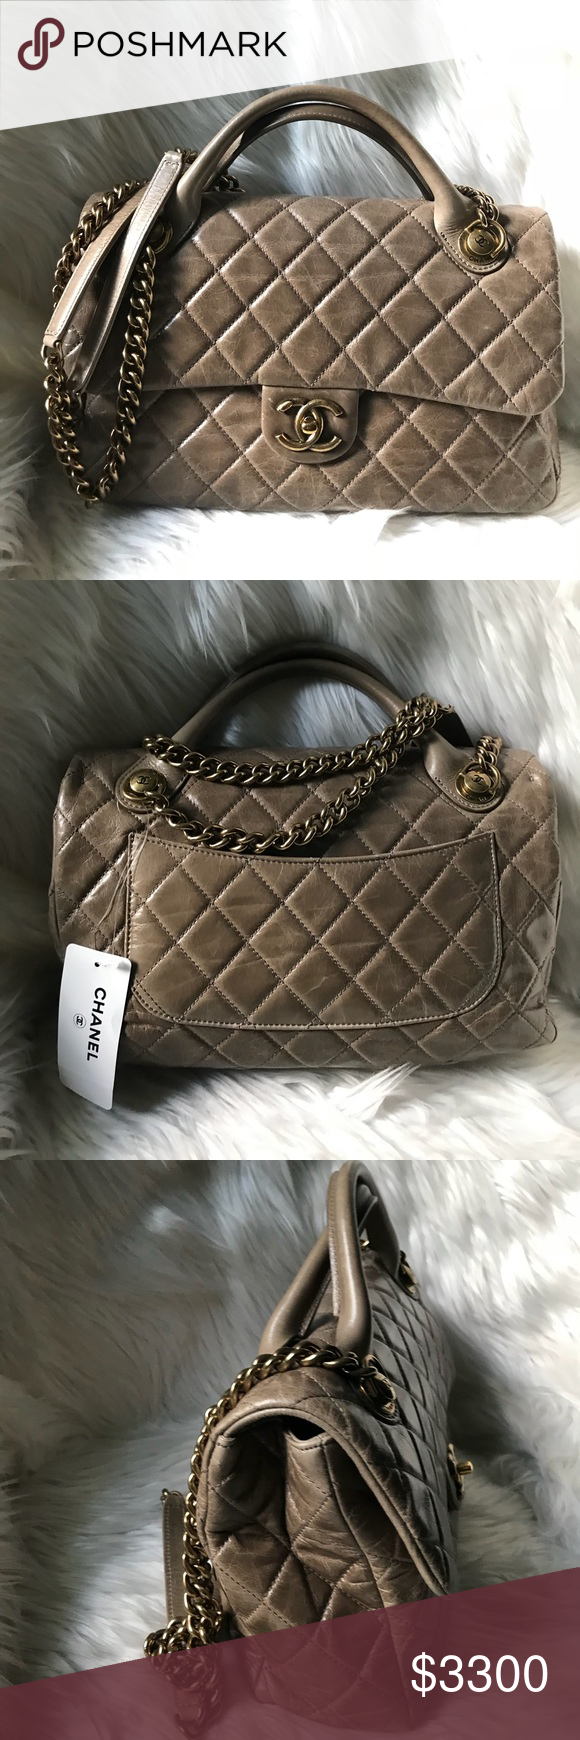 172e8869e5ec CHANEL Calfskin Medium Castle Rock Top Handle Bag CHANEL Grey Quilted  Glazed Calfskin Leather Medium Castle Rock Top Handle Bag 13x3.… | My Posh  Closet